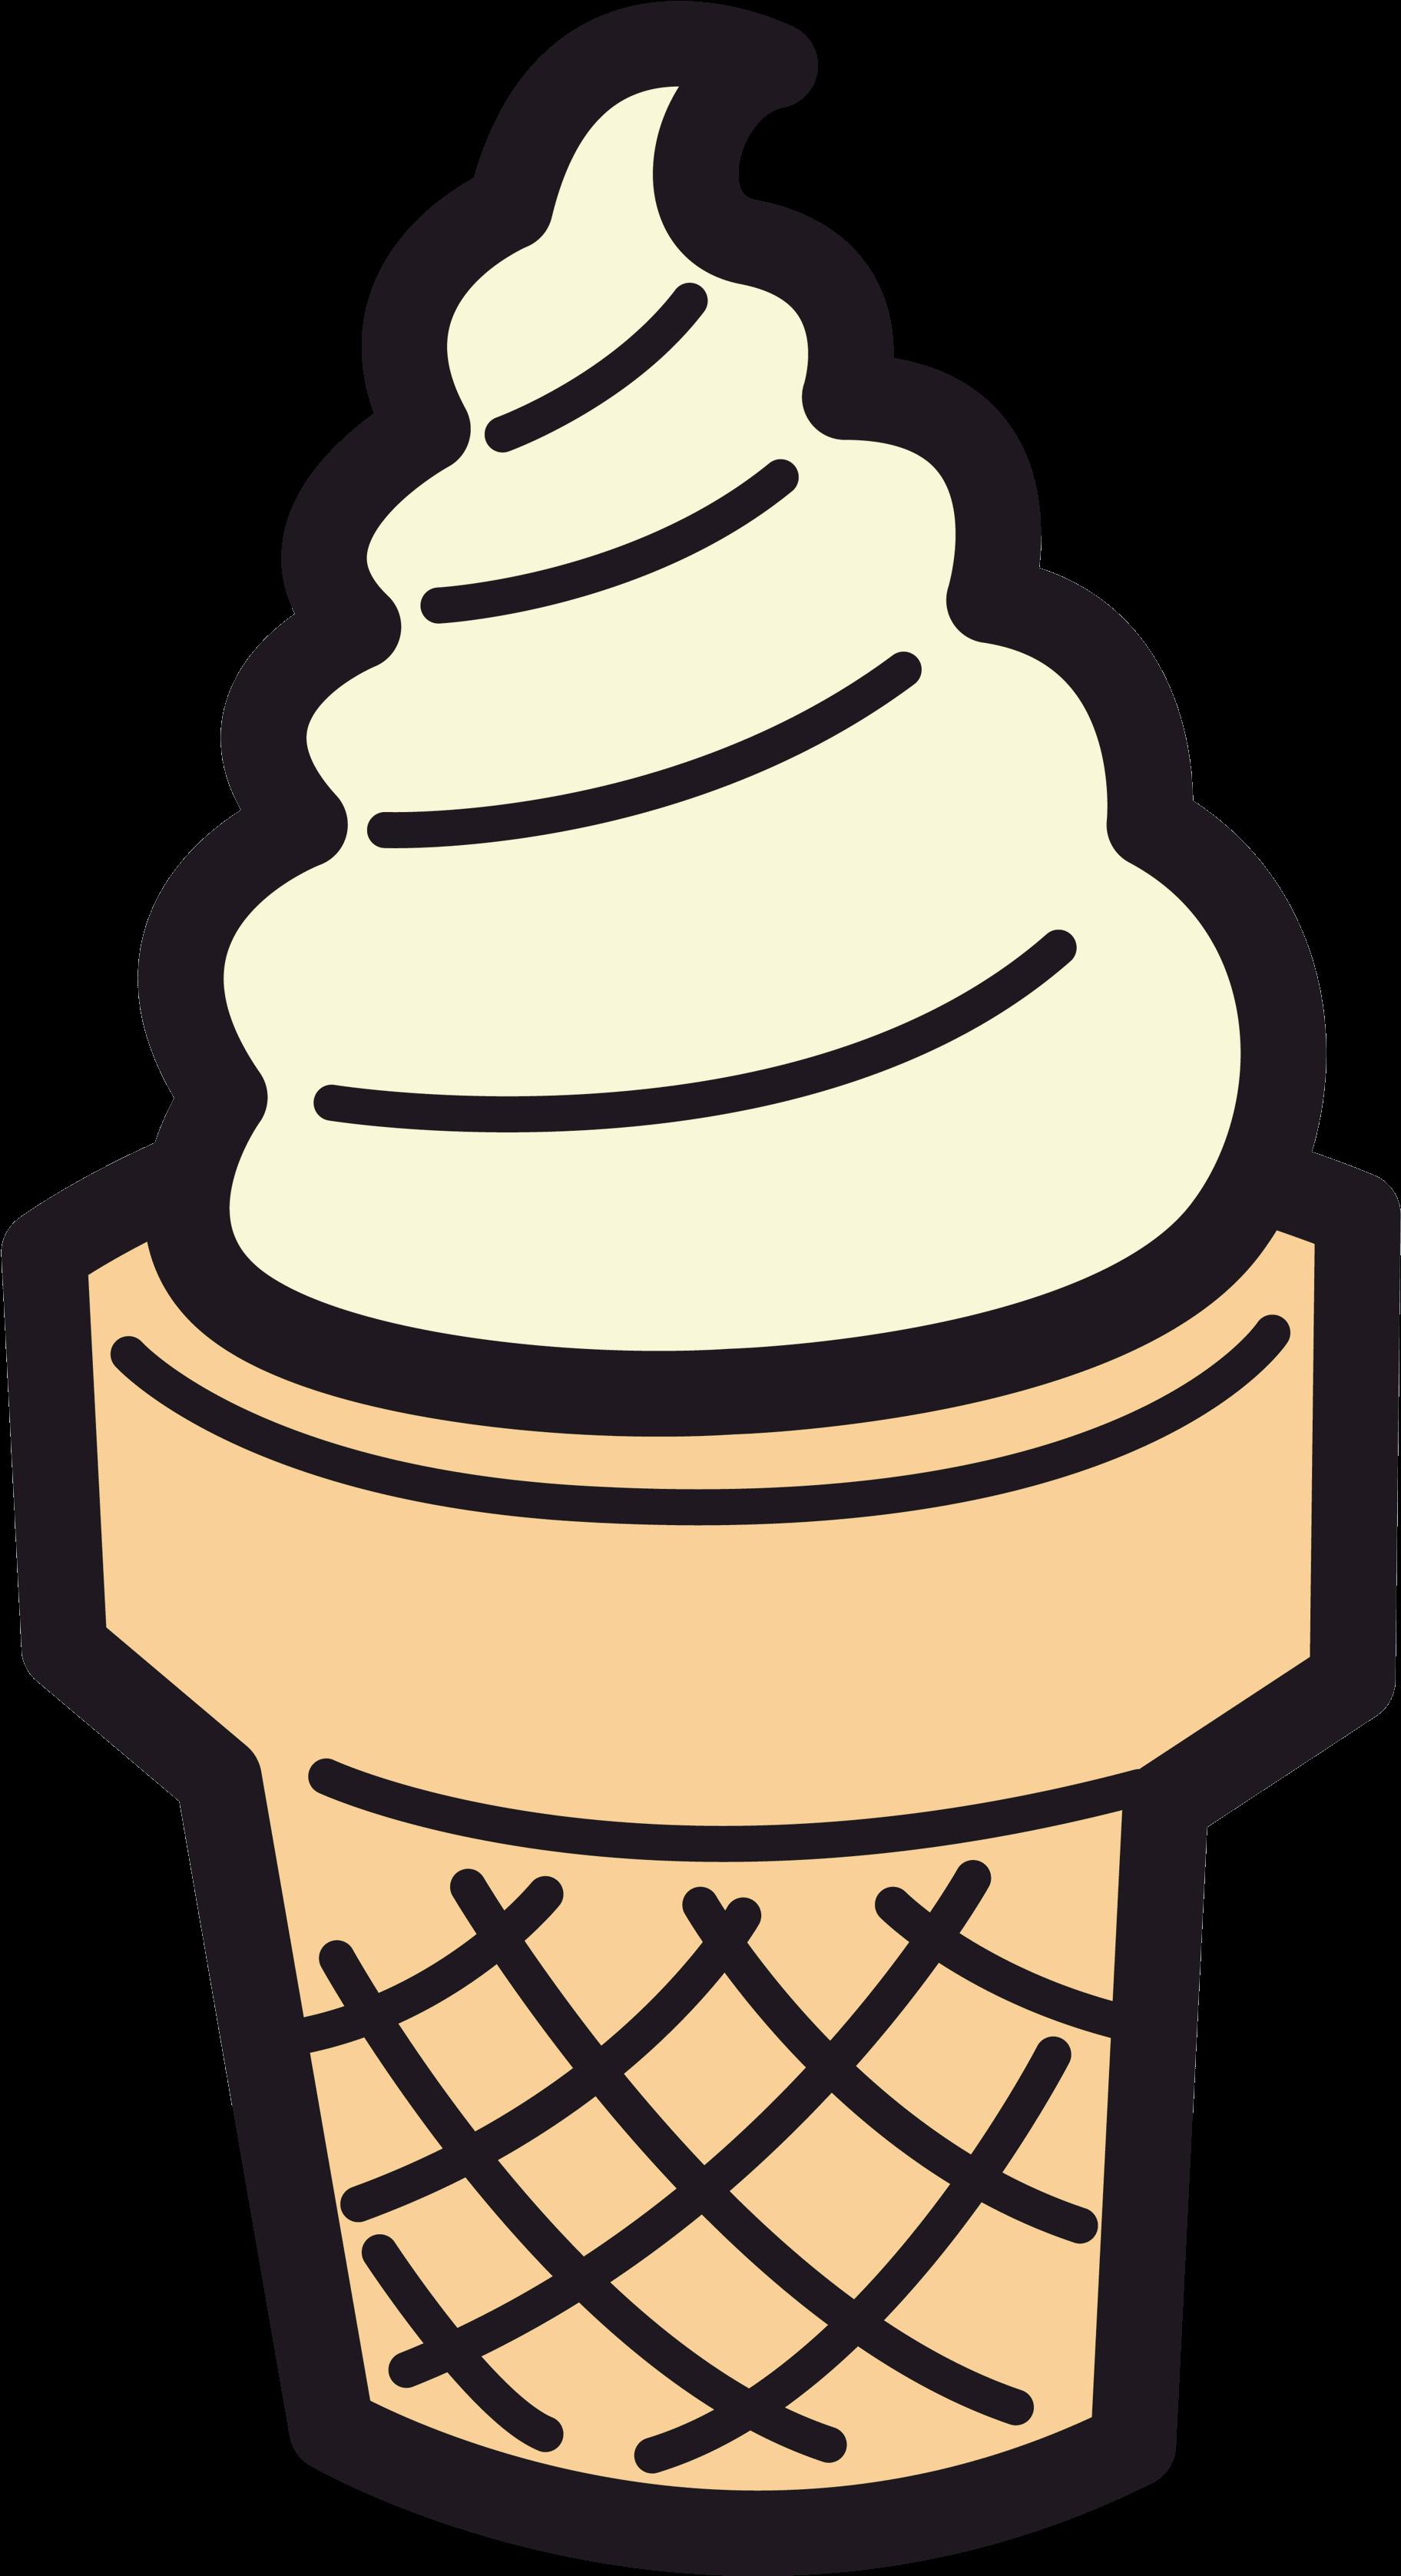 Ice Cream Cone Clipart Sundae Clipart Cartoon Pencil.